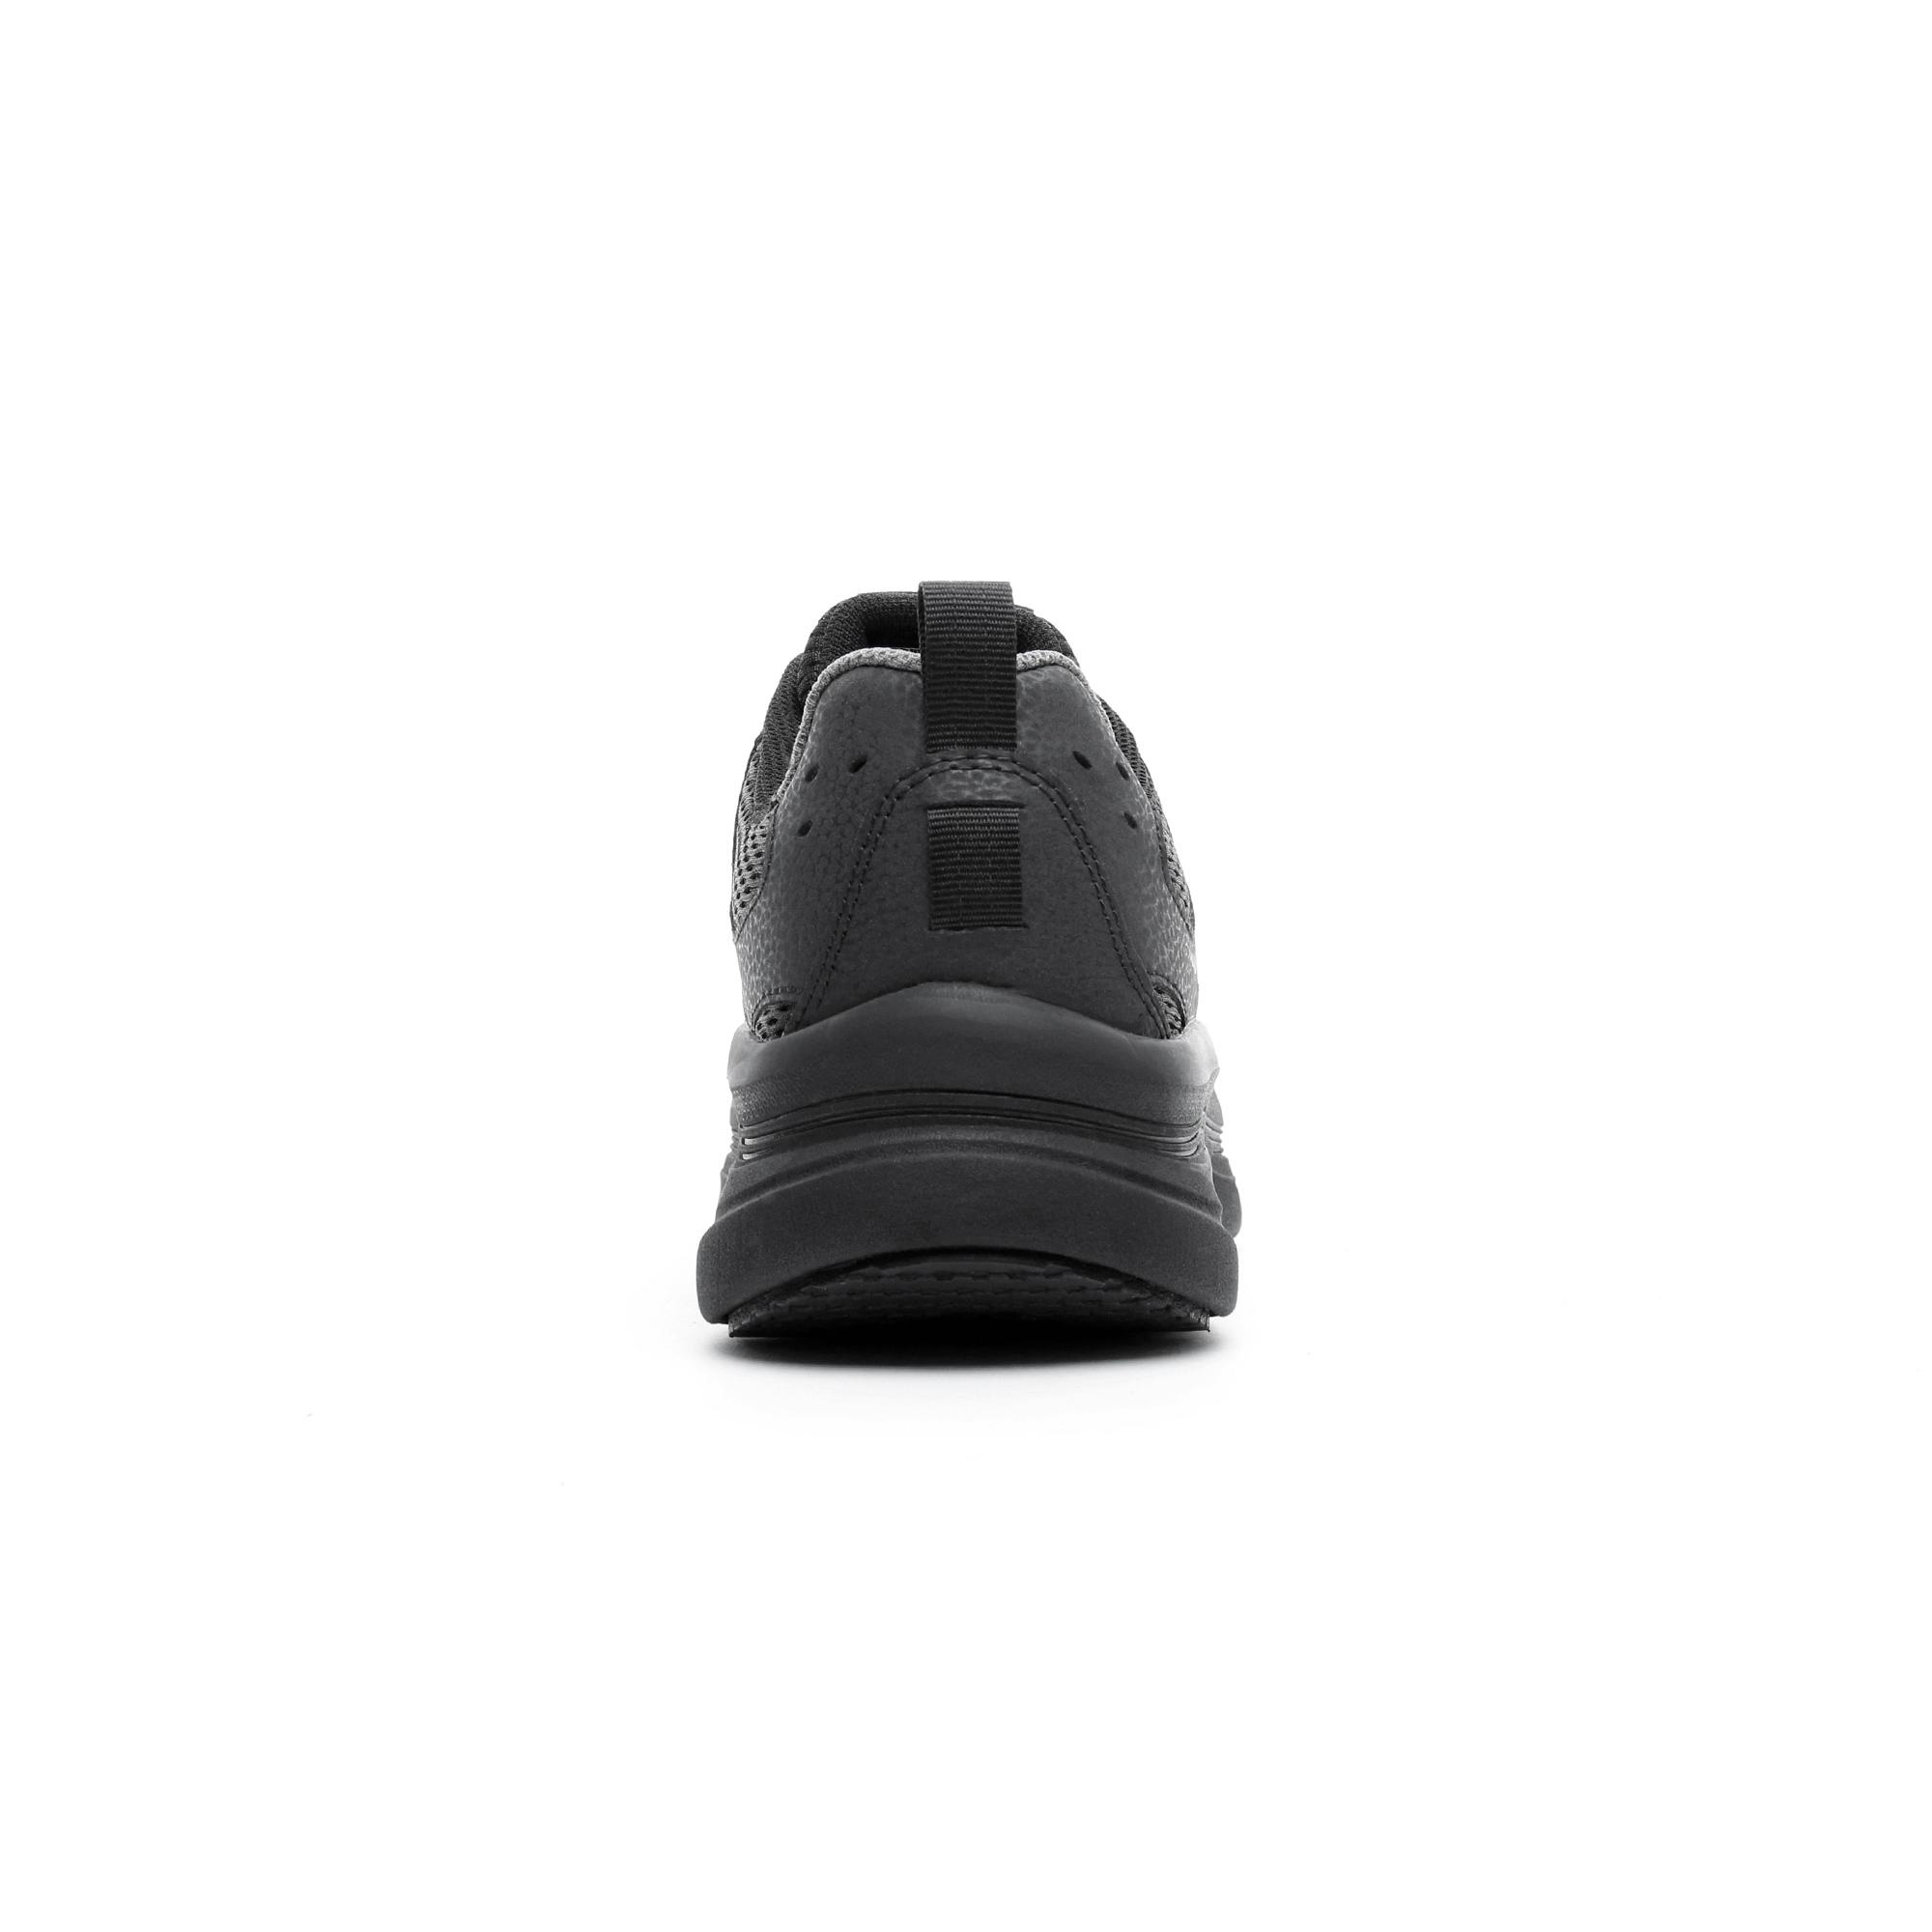 Skechers D'Lux Walker Erkek Siyah Spor Ayakkabı